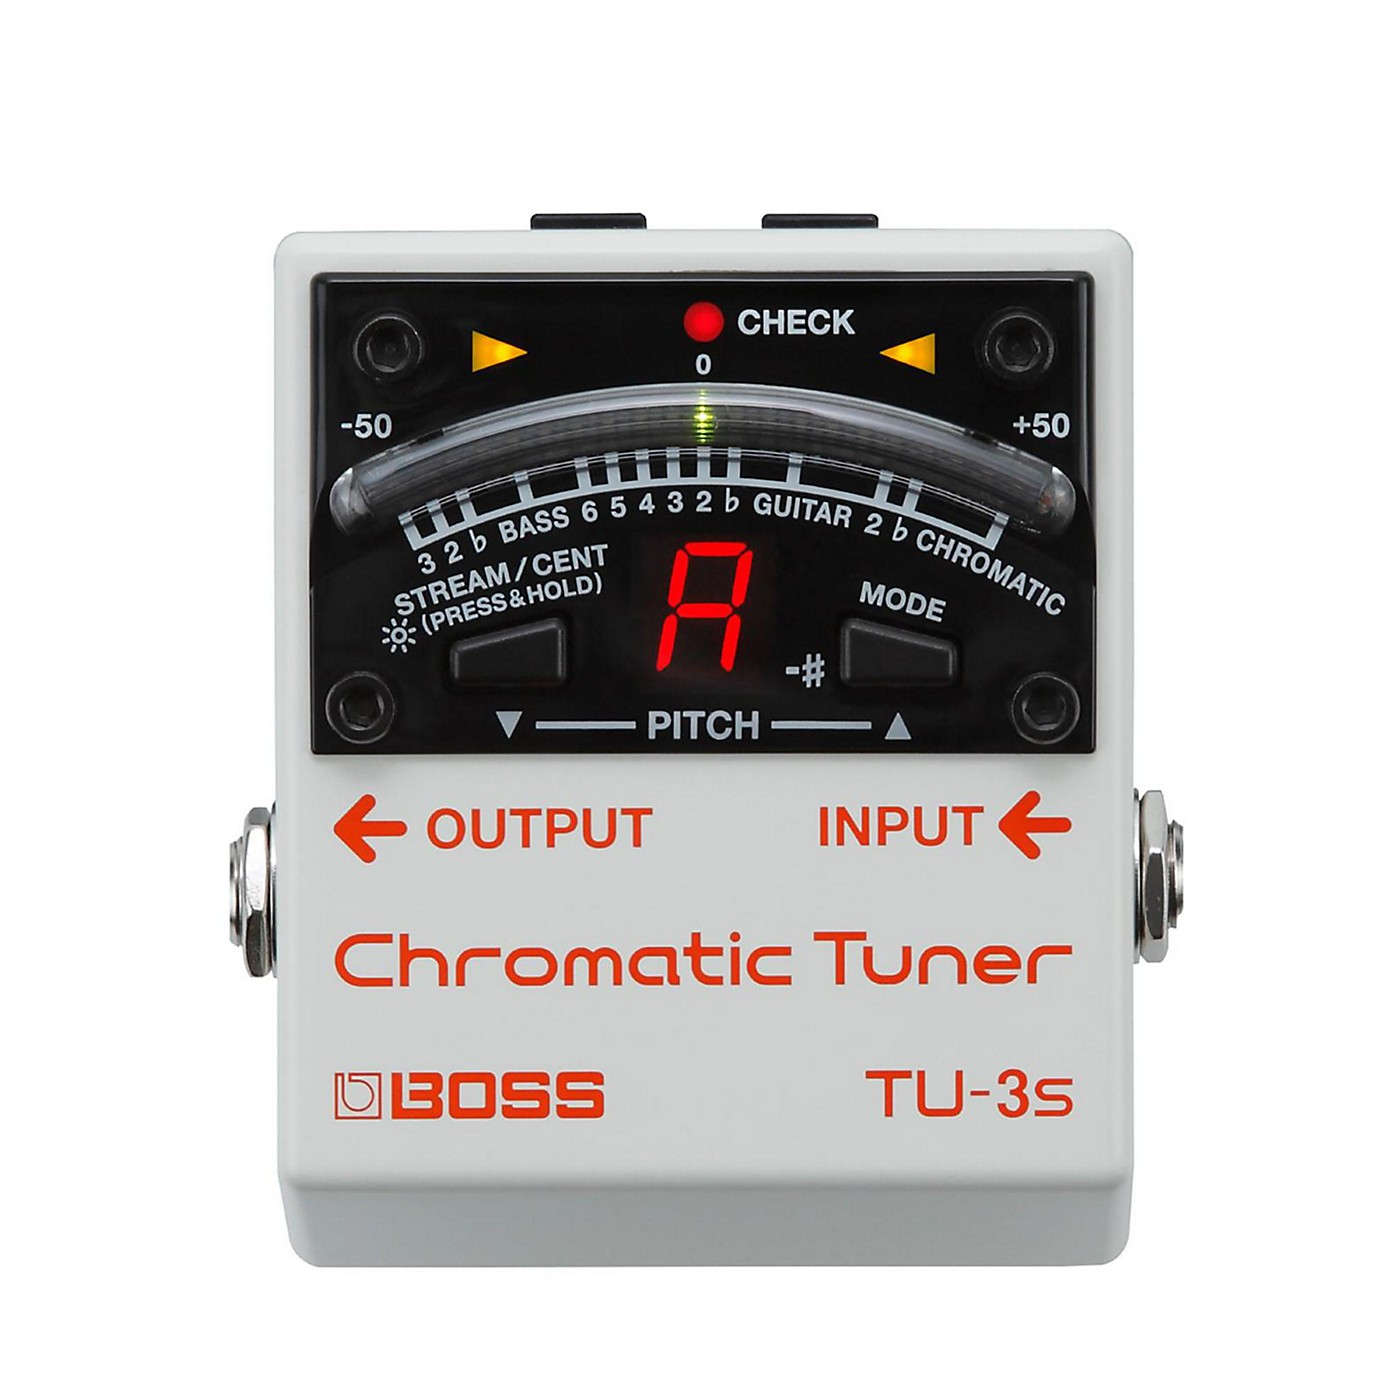 BOSS TU-3S Chromatic Tuner thumbnail